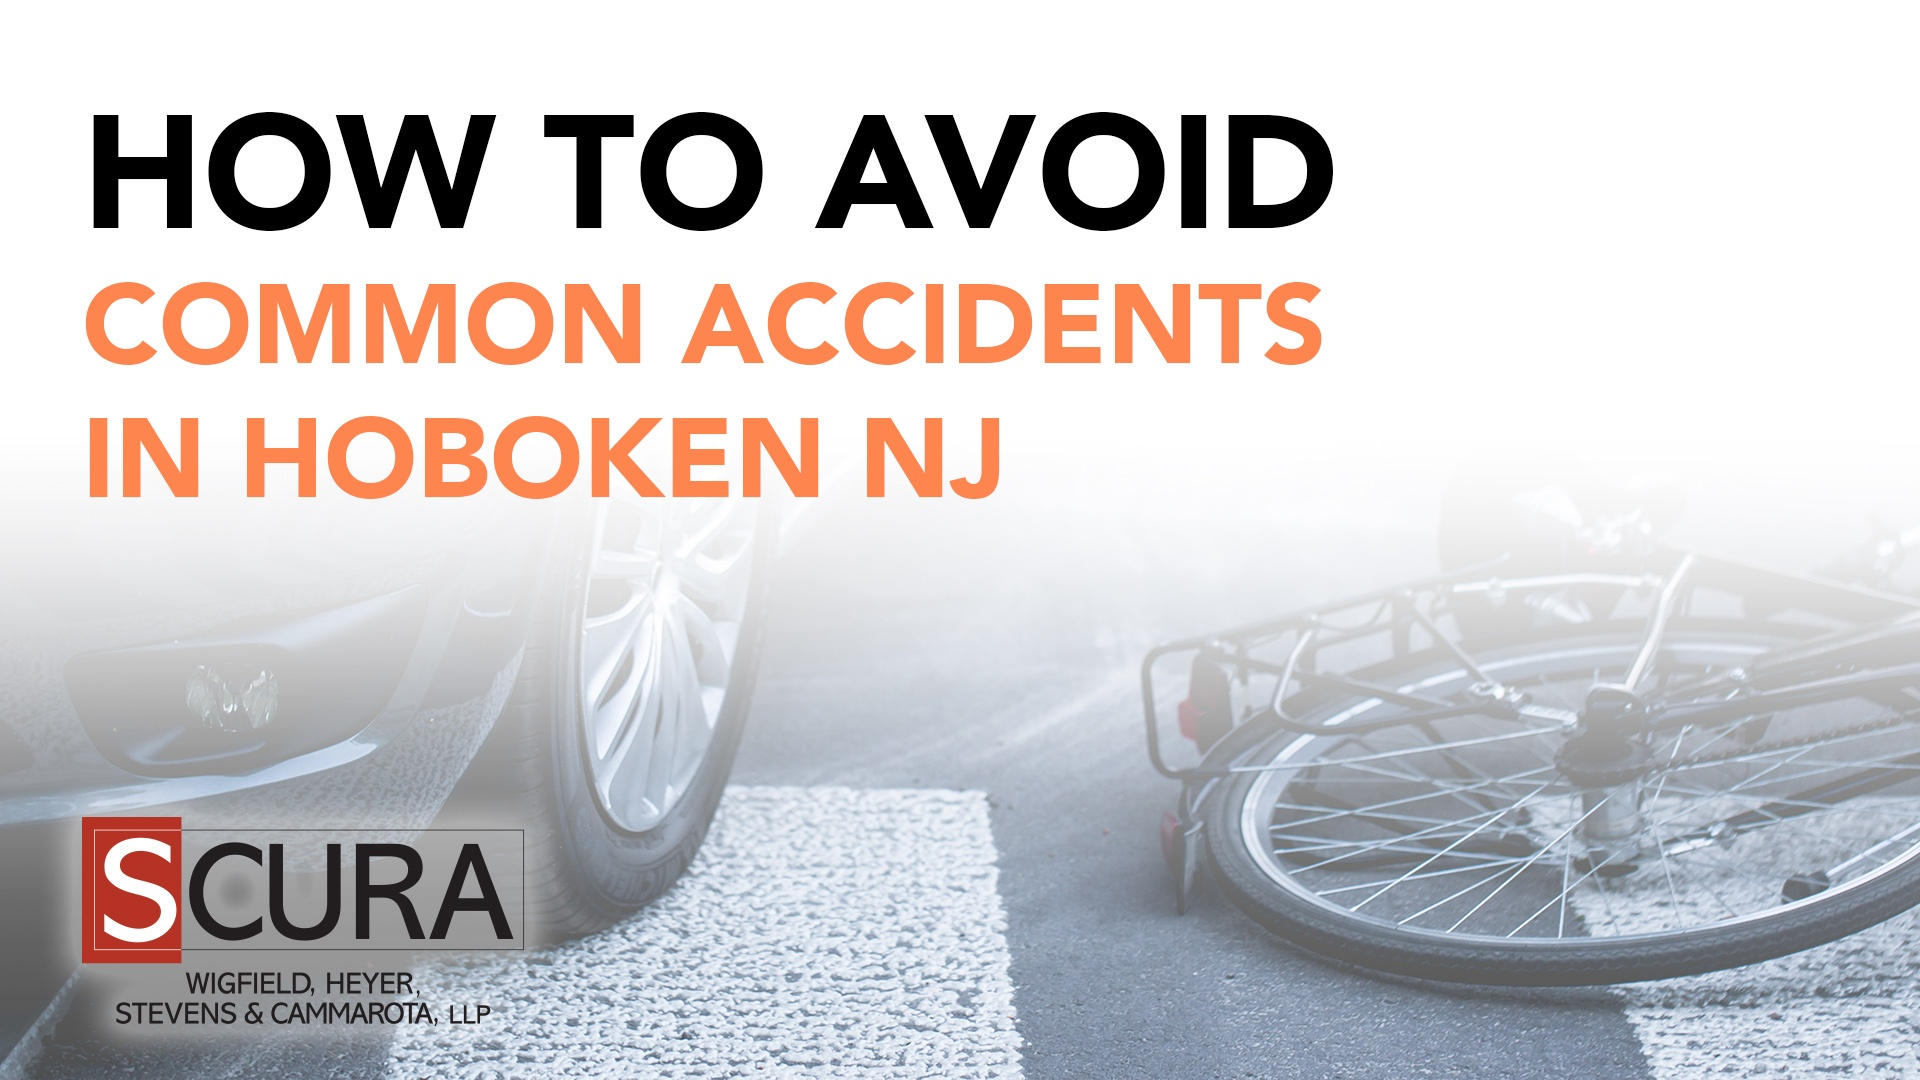 Hoboken-accident-injury